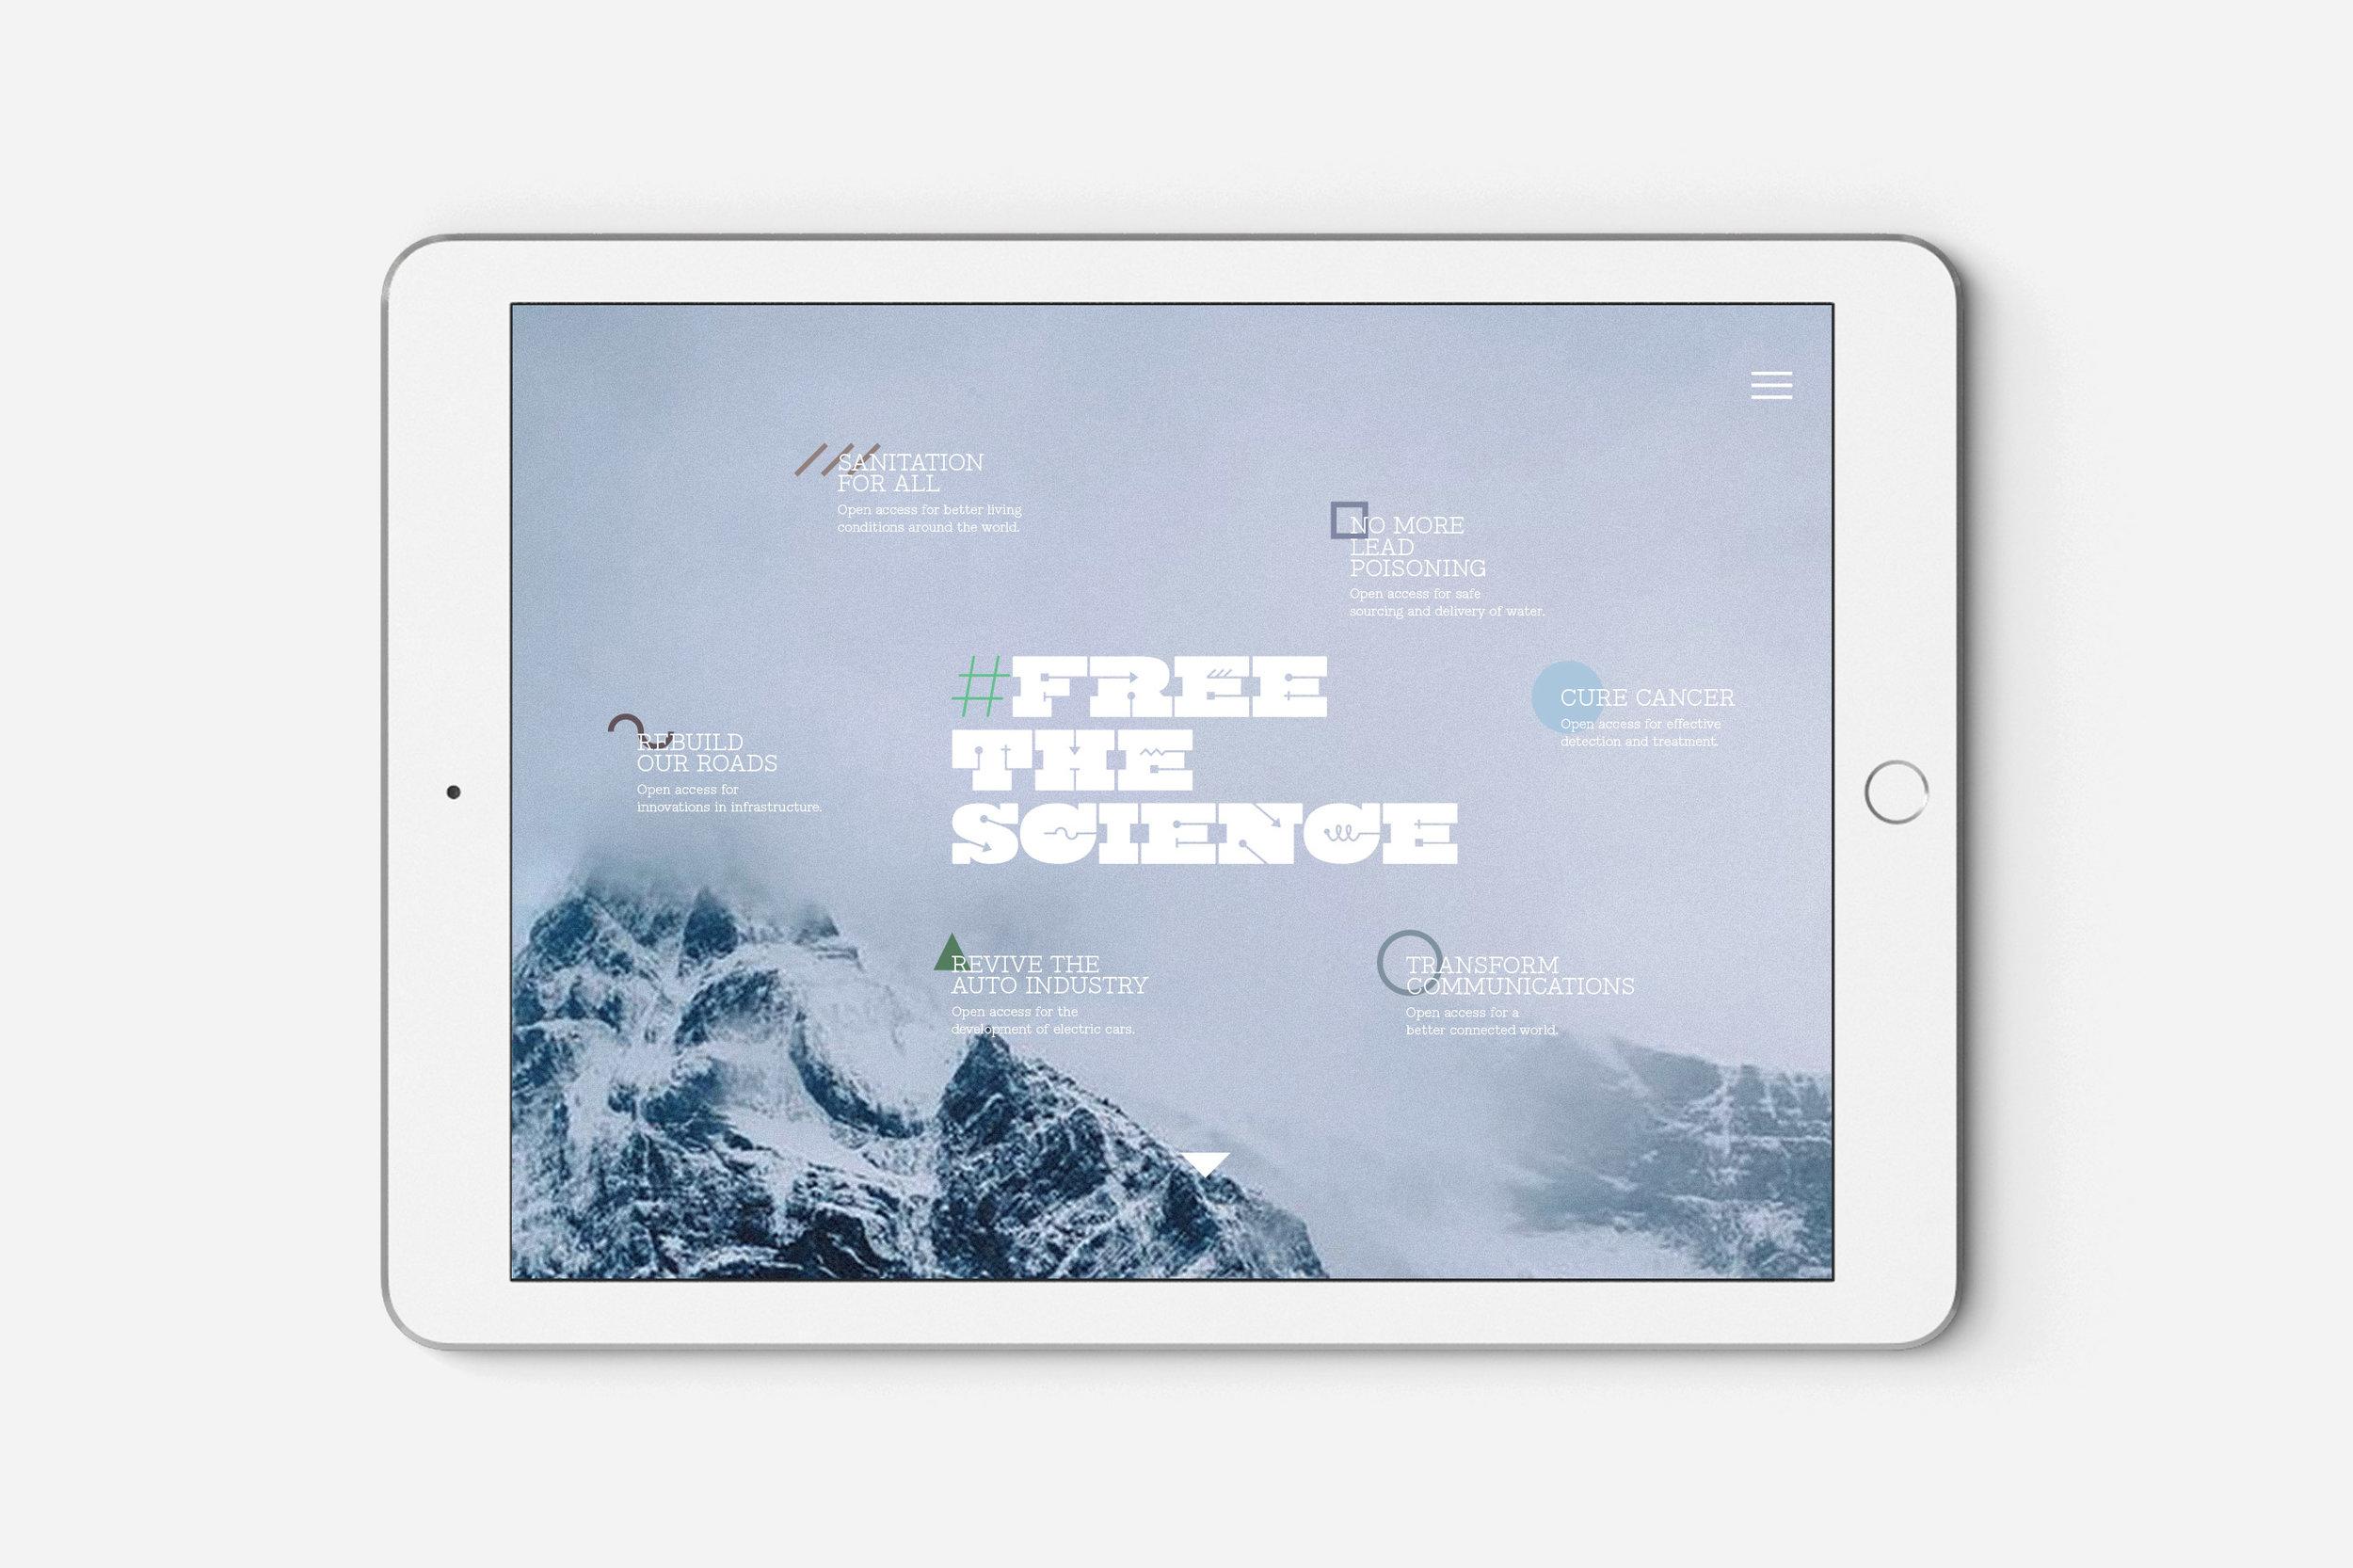 FTS_Website_iPad_1.jpg